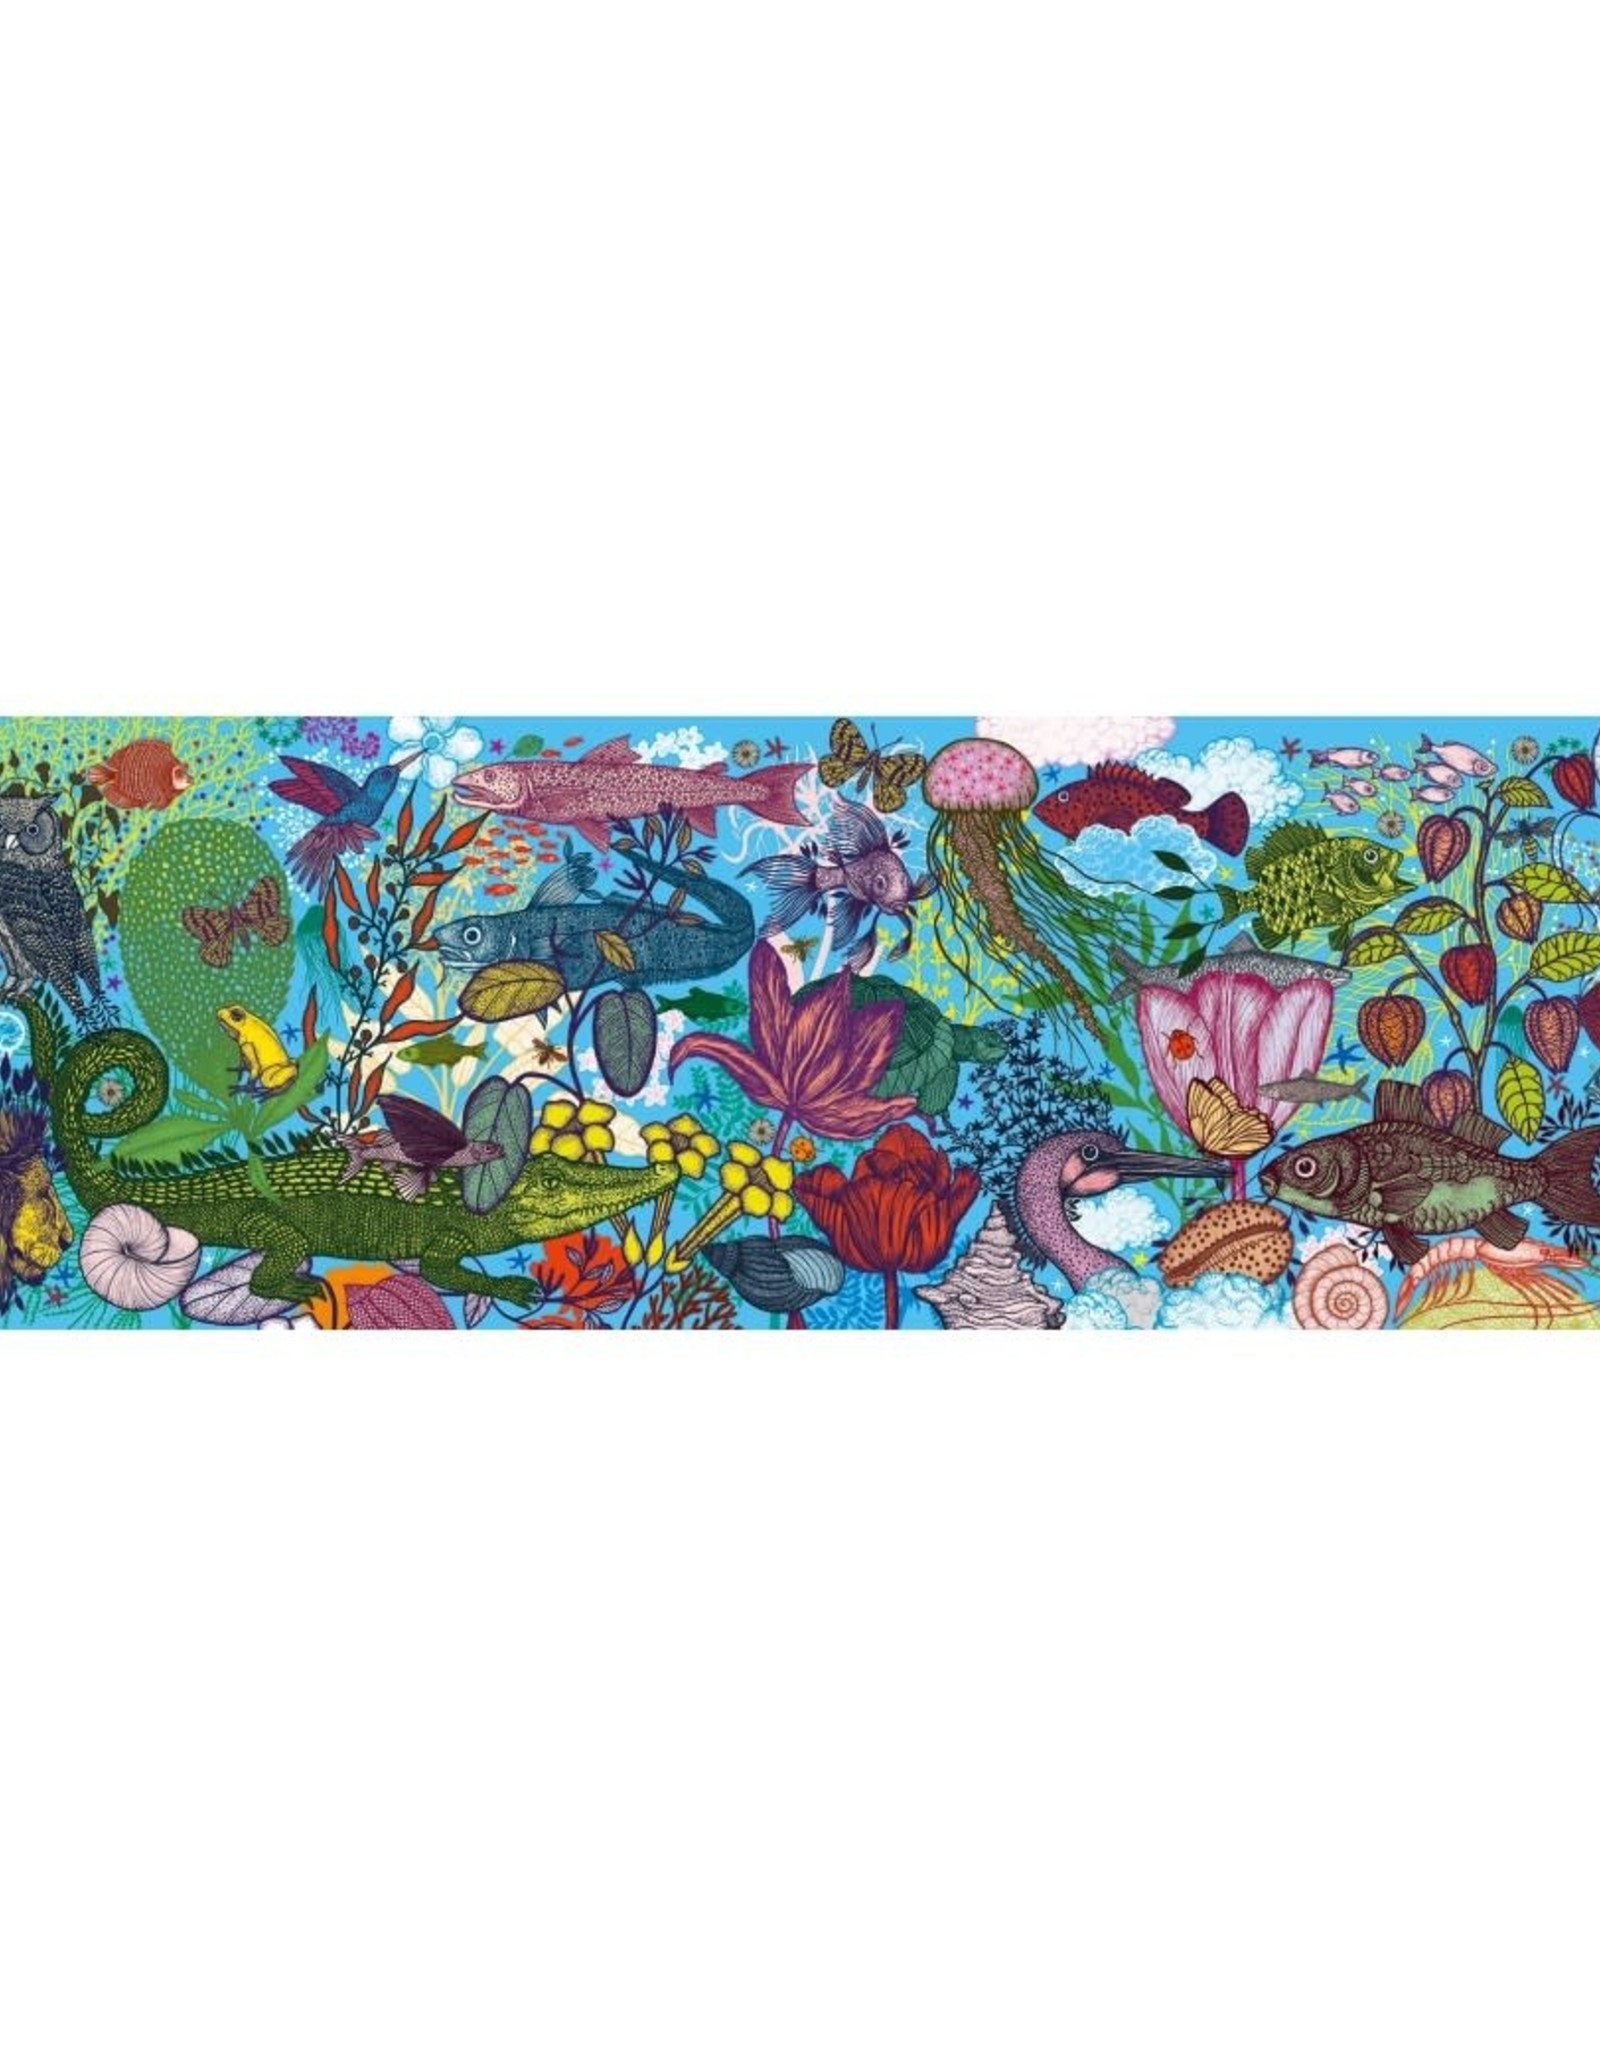 Djeco Djeco Gallery Puzzle Land And Sea